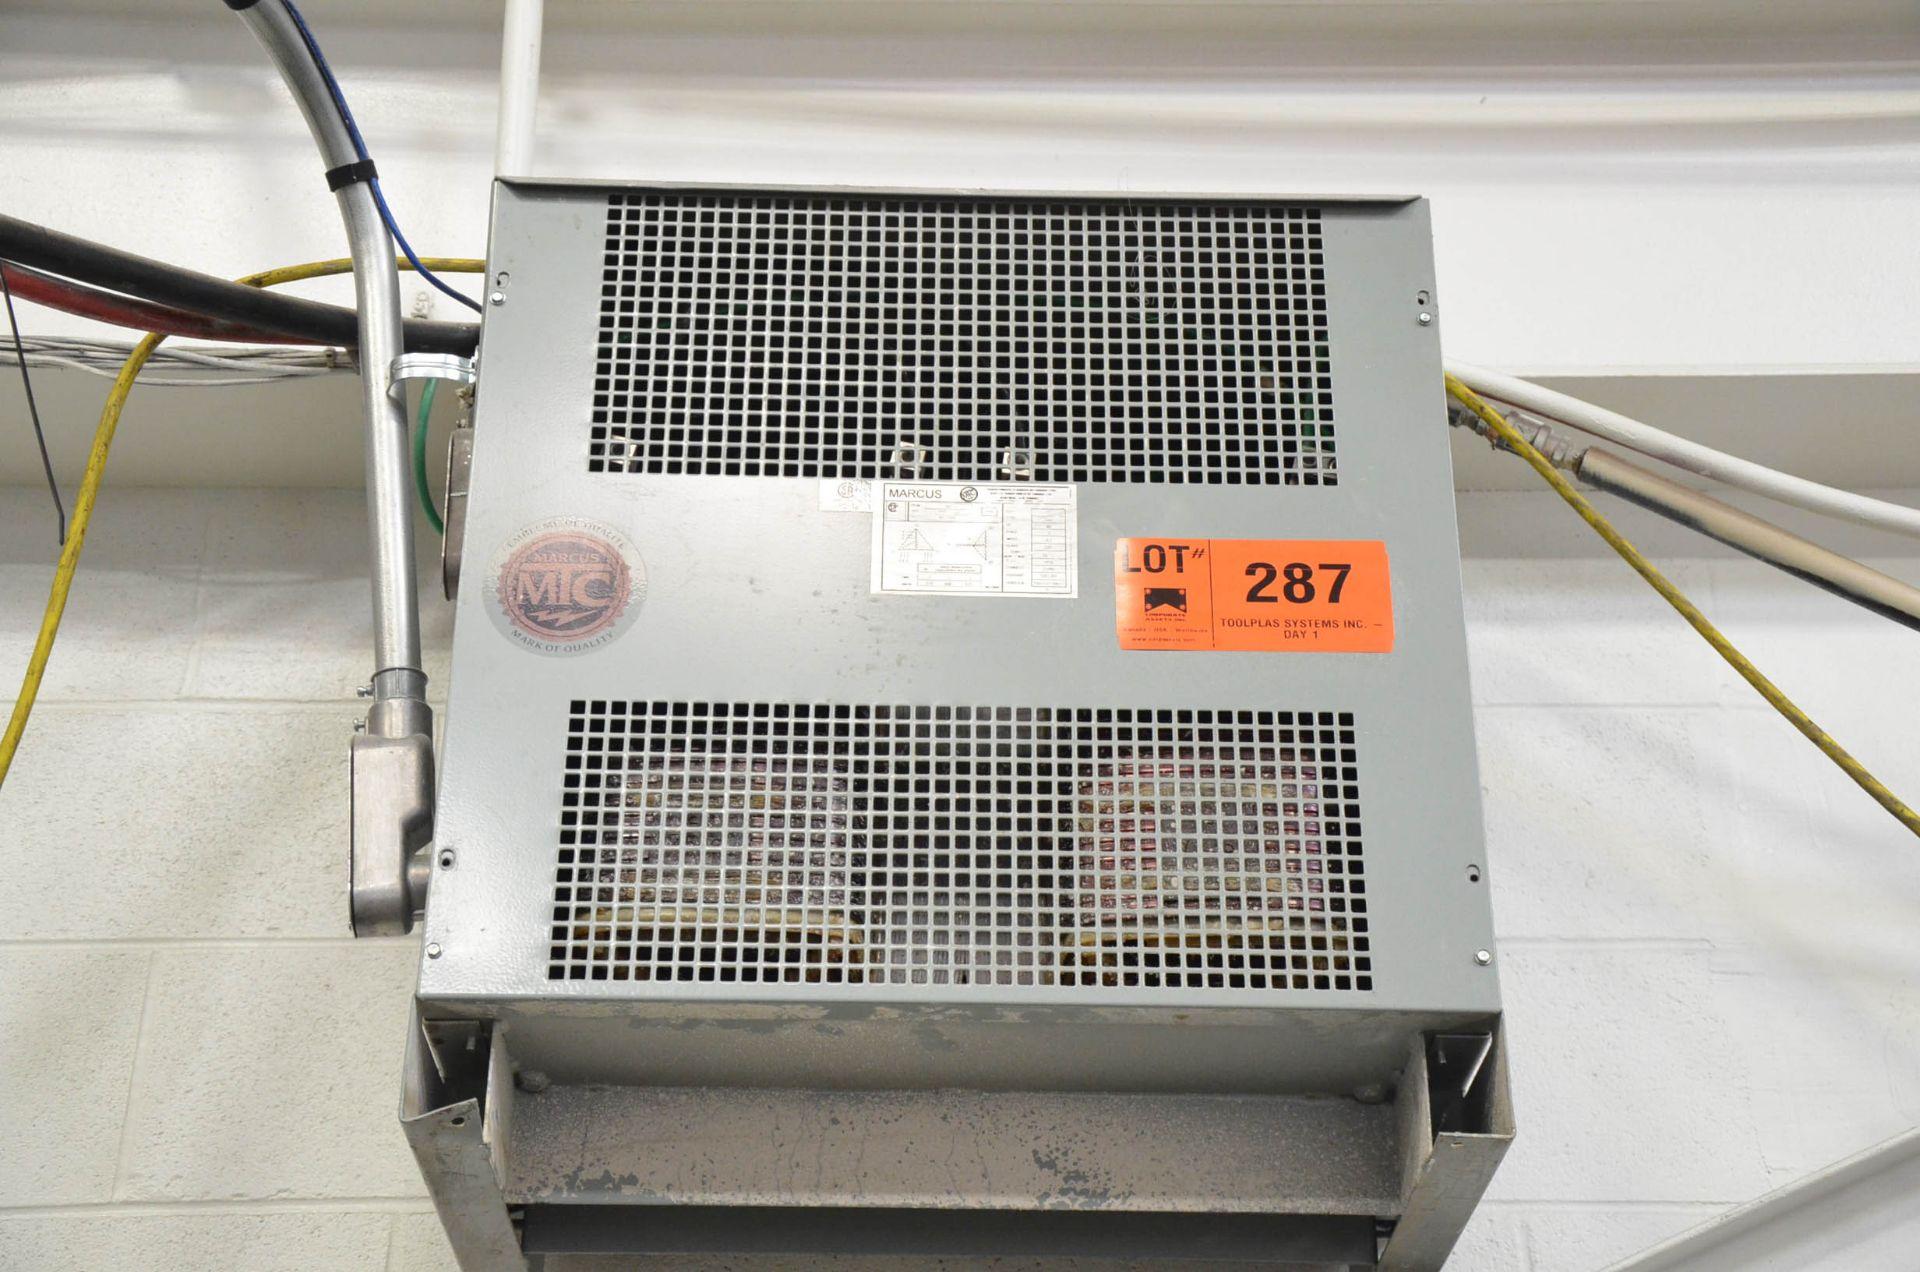 MARCUS 75KVA/600-480-277V/3PH/60HZ TRANSFORMER (CI) [RIGGING FEES FOR LOT #287 - $50 USD PLUS